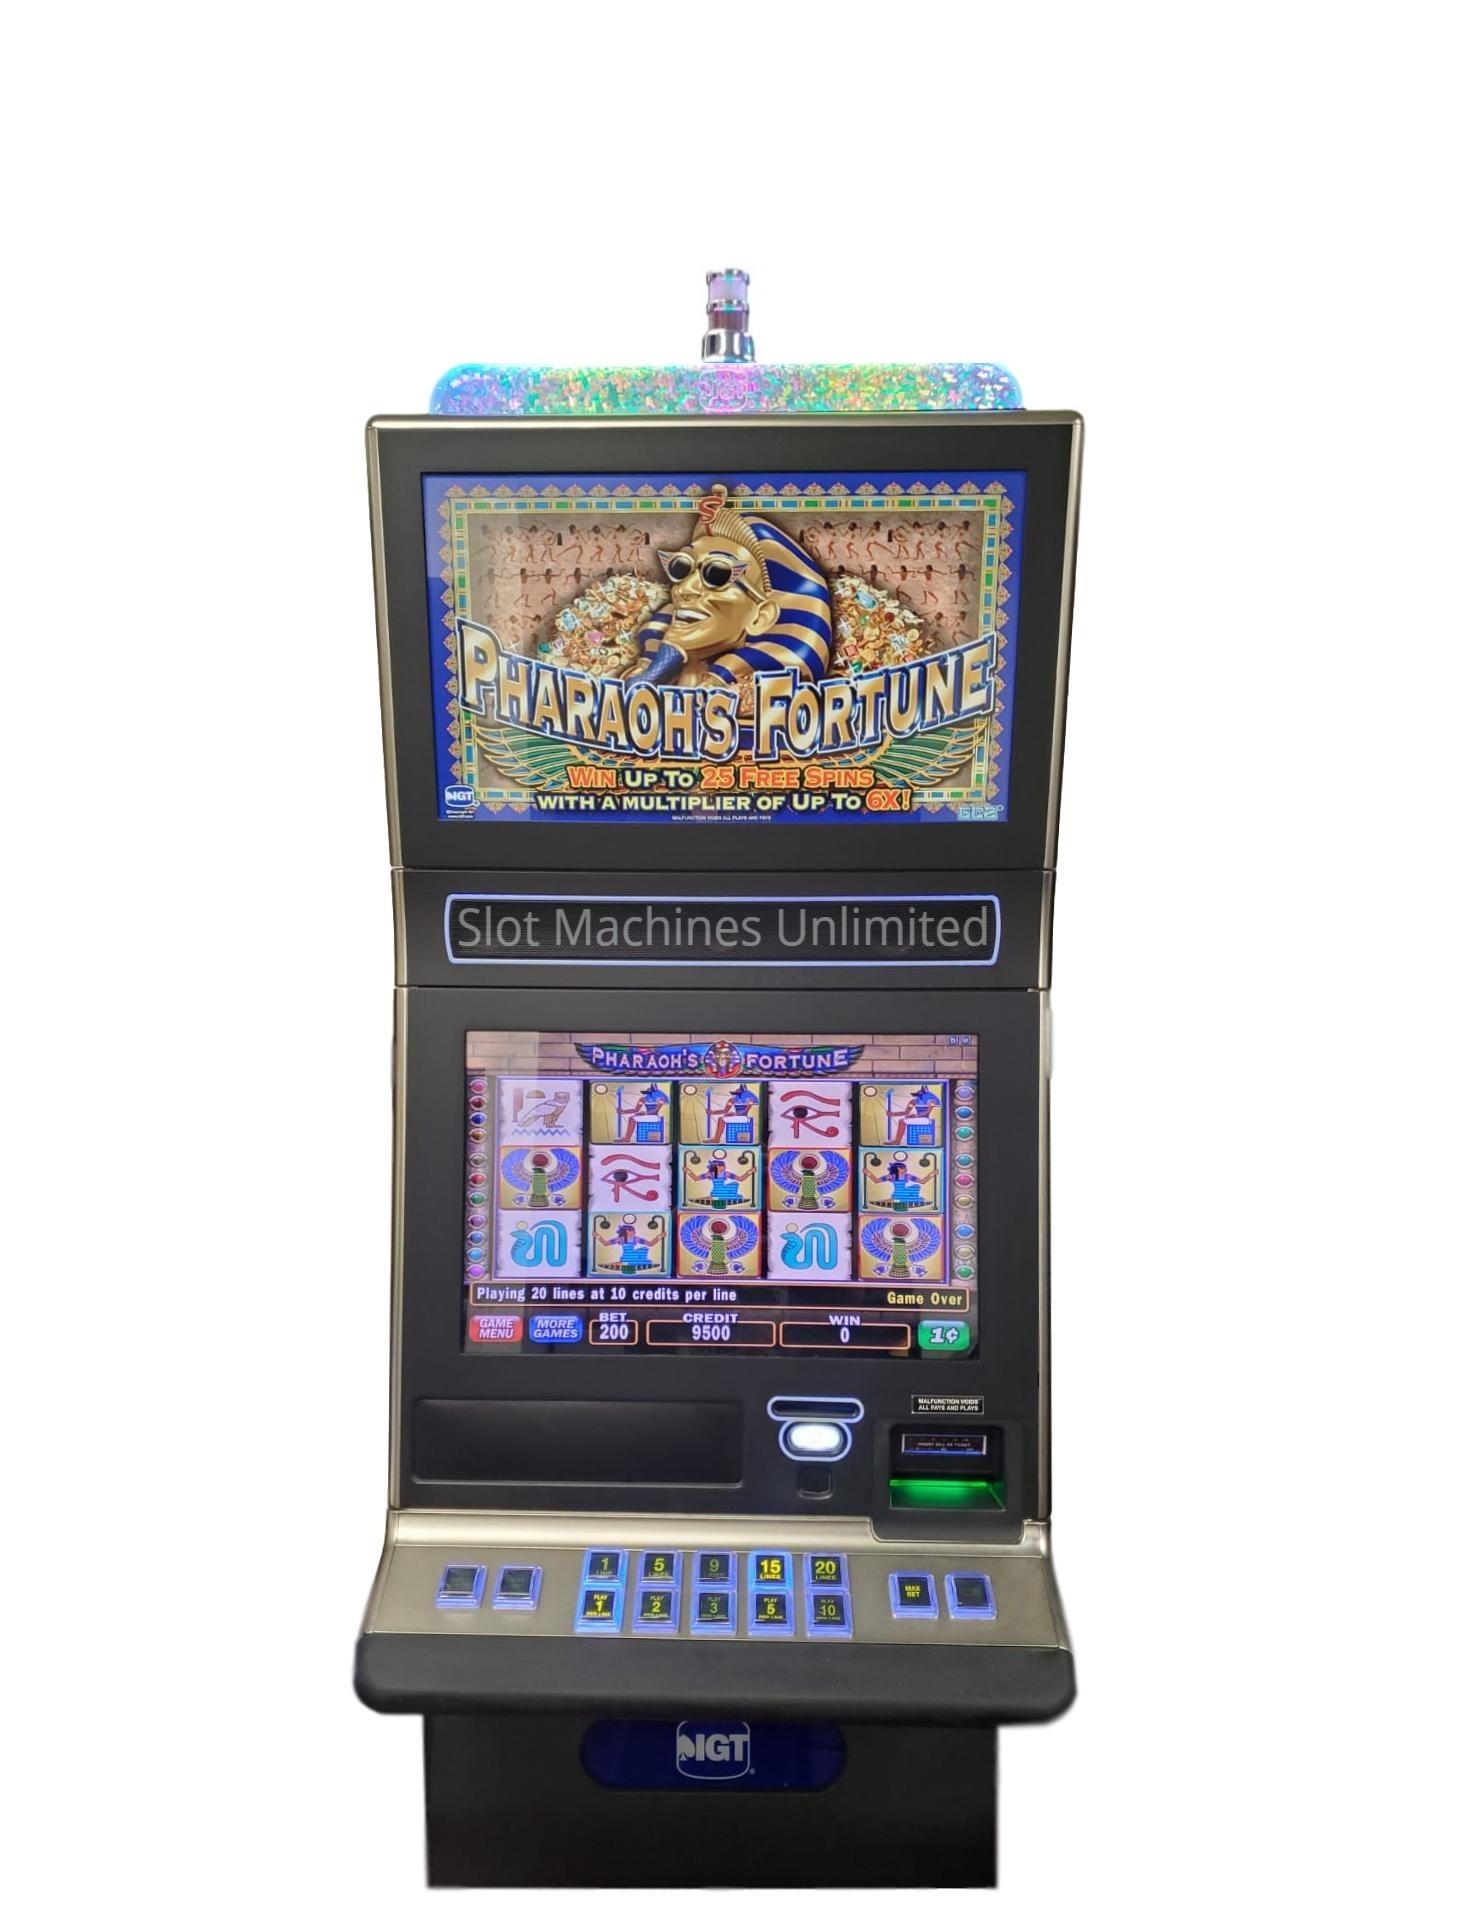 Pharaohs Fortune Slot Machine For Sale